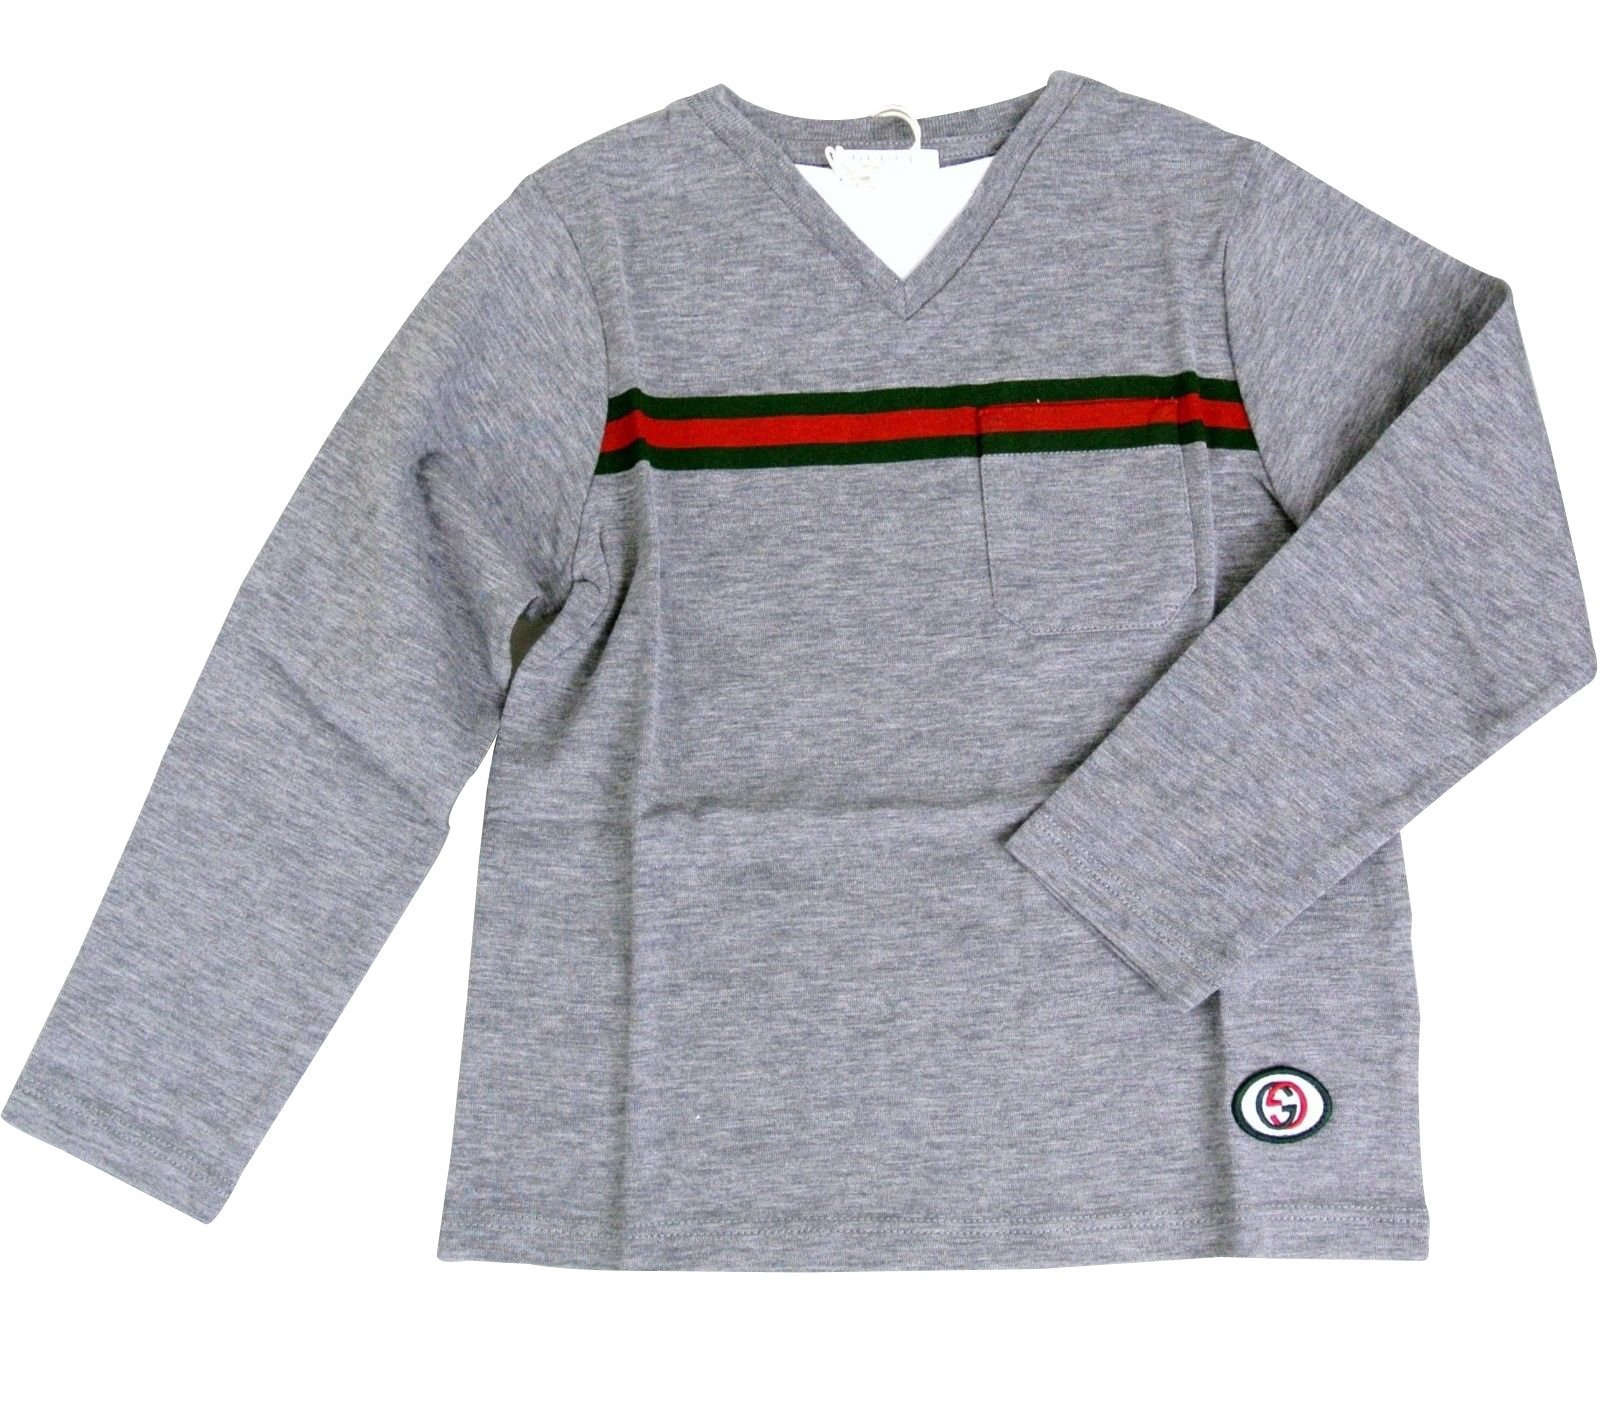 Gucci Gray Cotton GRG Web Interlocking G Long Sleeve Top T-Shirt 271373 (3)